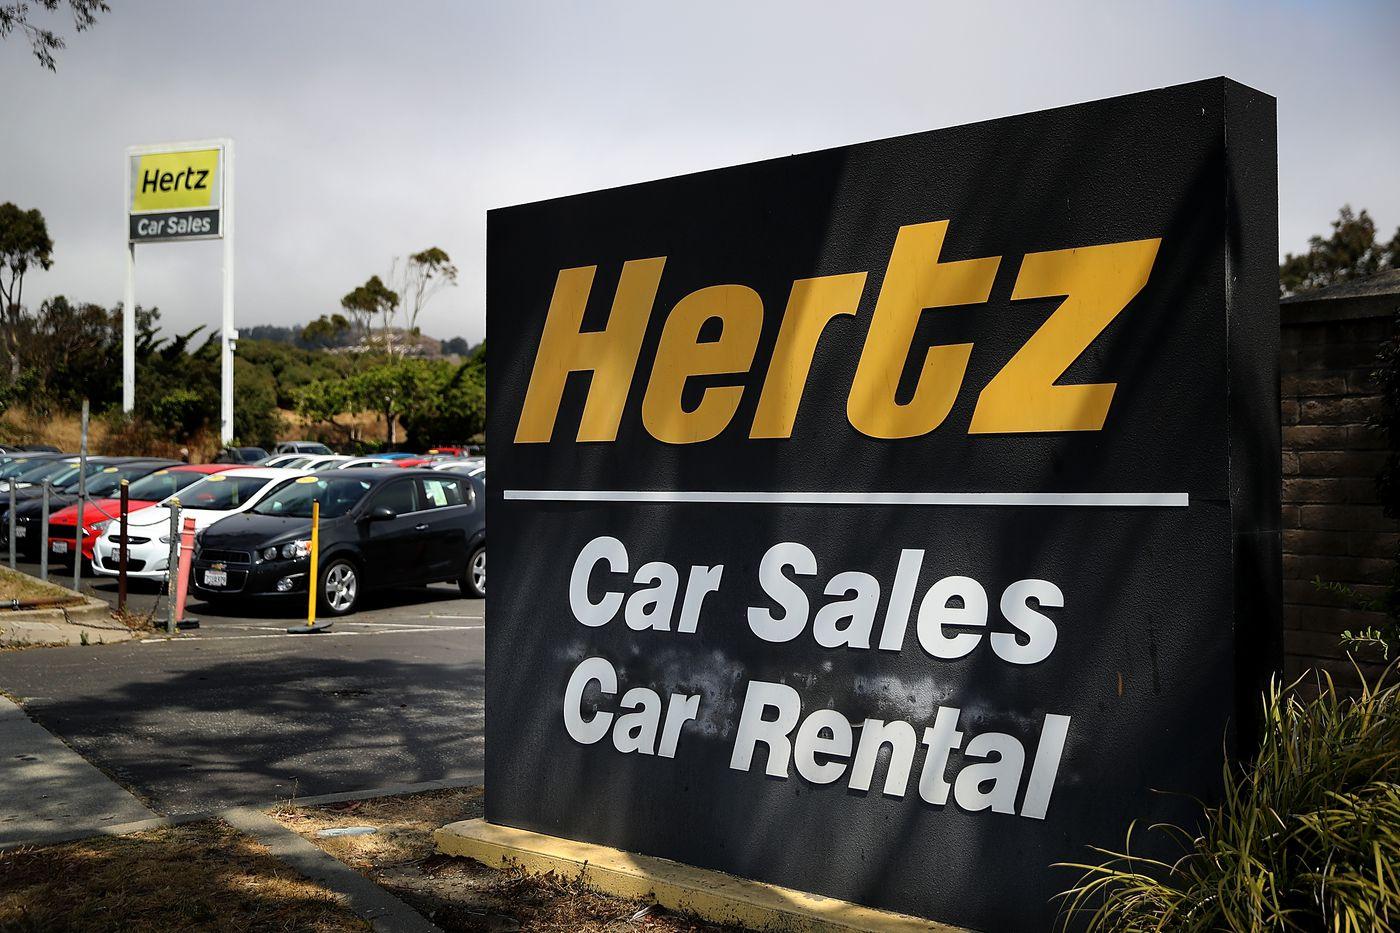 Hertz Launches 1 000 Per Month Car Subscription Service The Verge